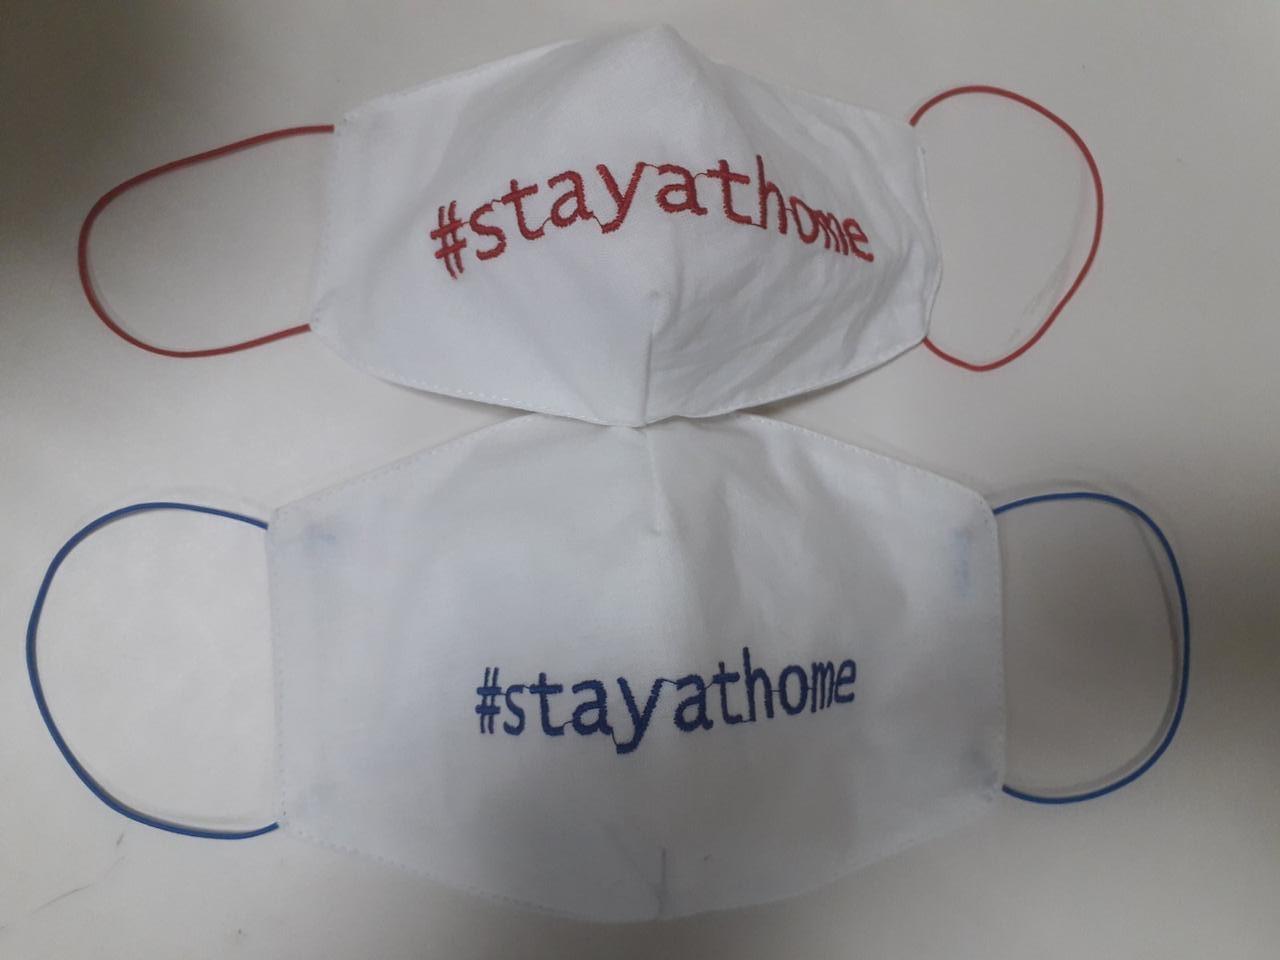 Маска медицинская многоразовая с вышивкой. #Stay at home